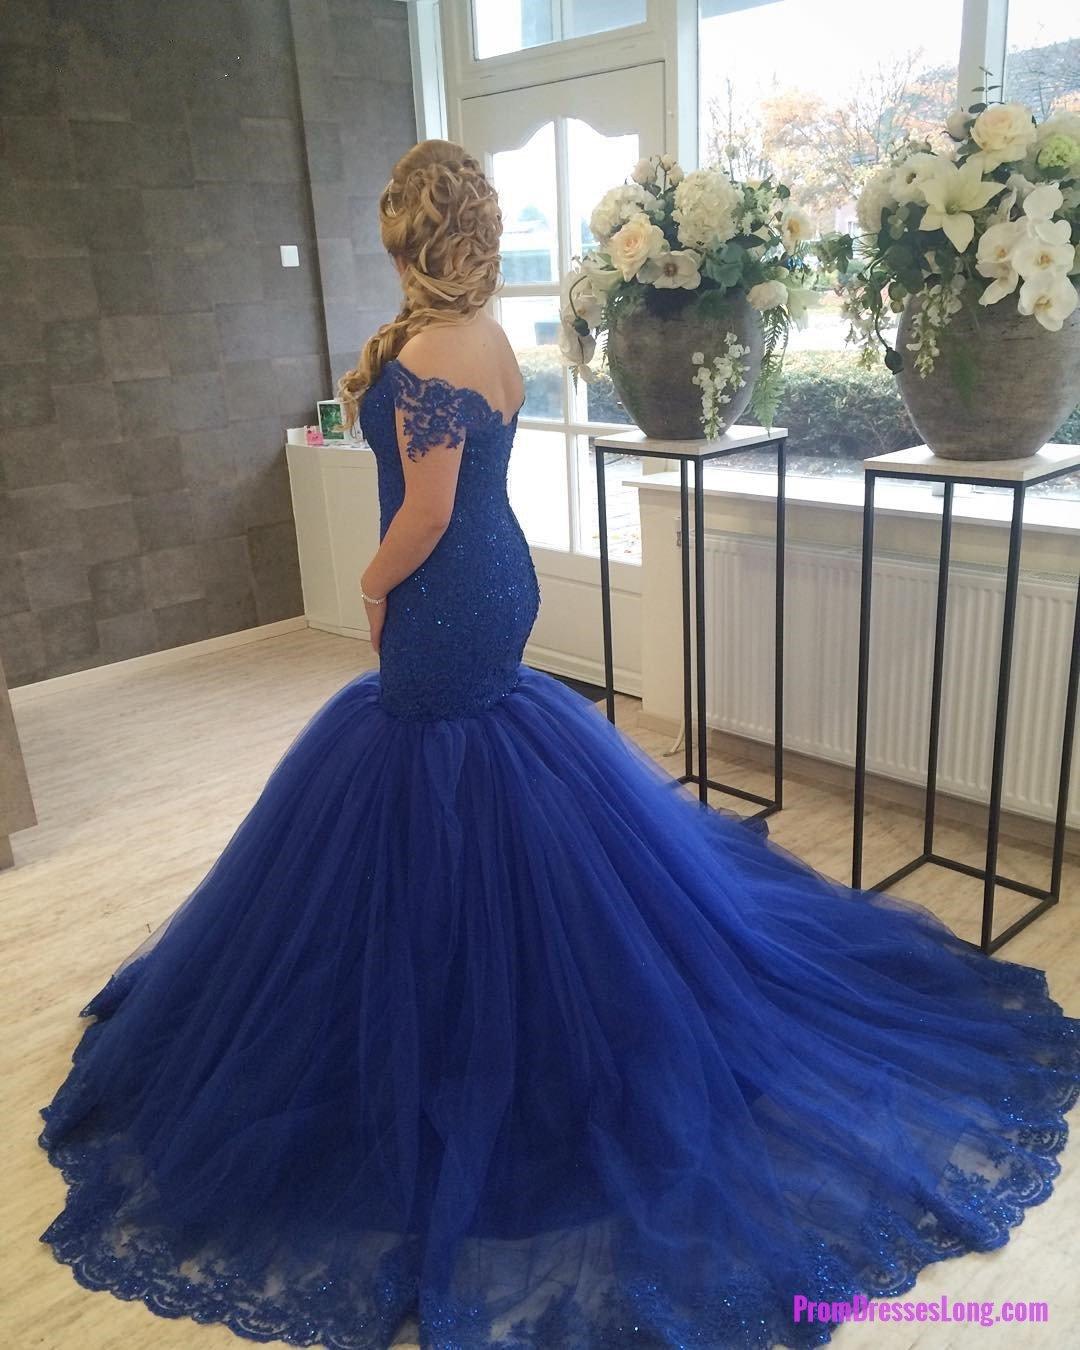 New arrival prom dressmodest prom dressroyal blue prom dresses